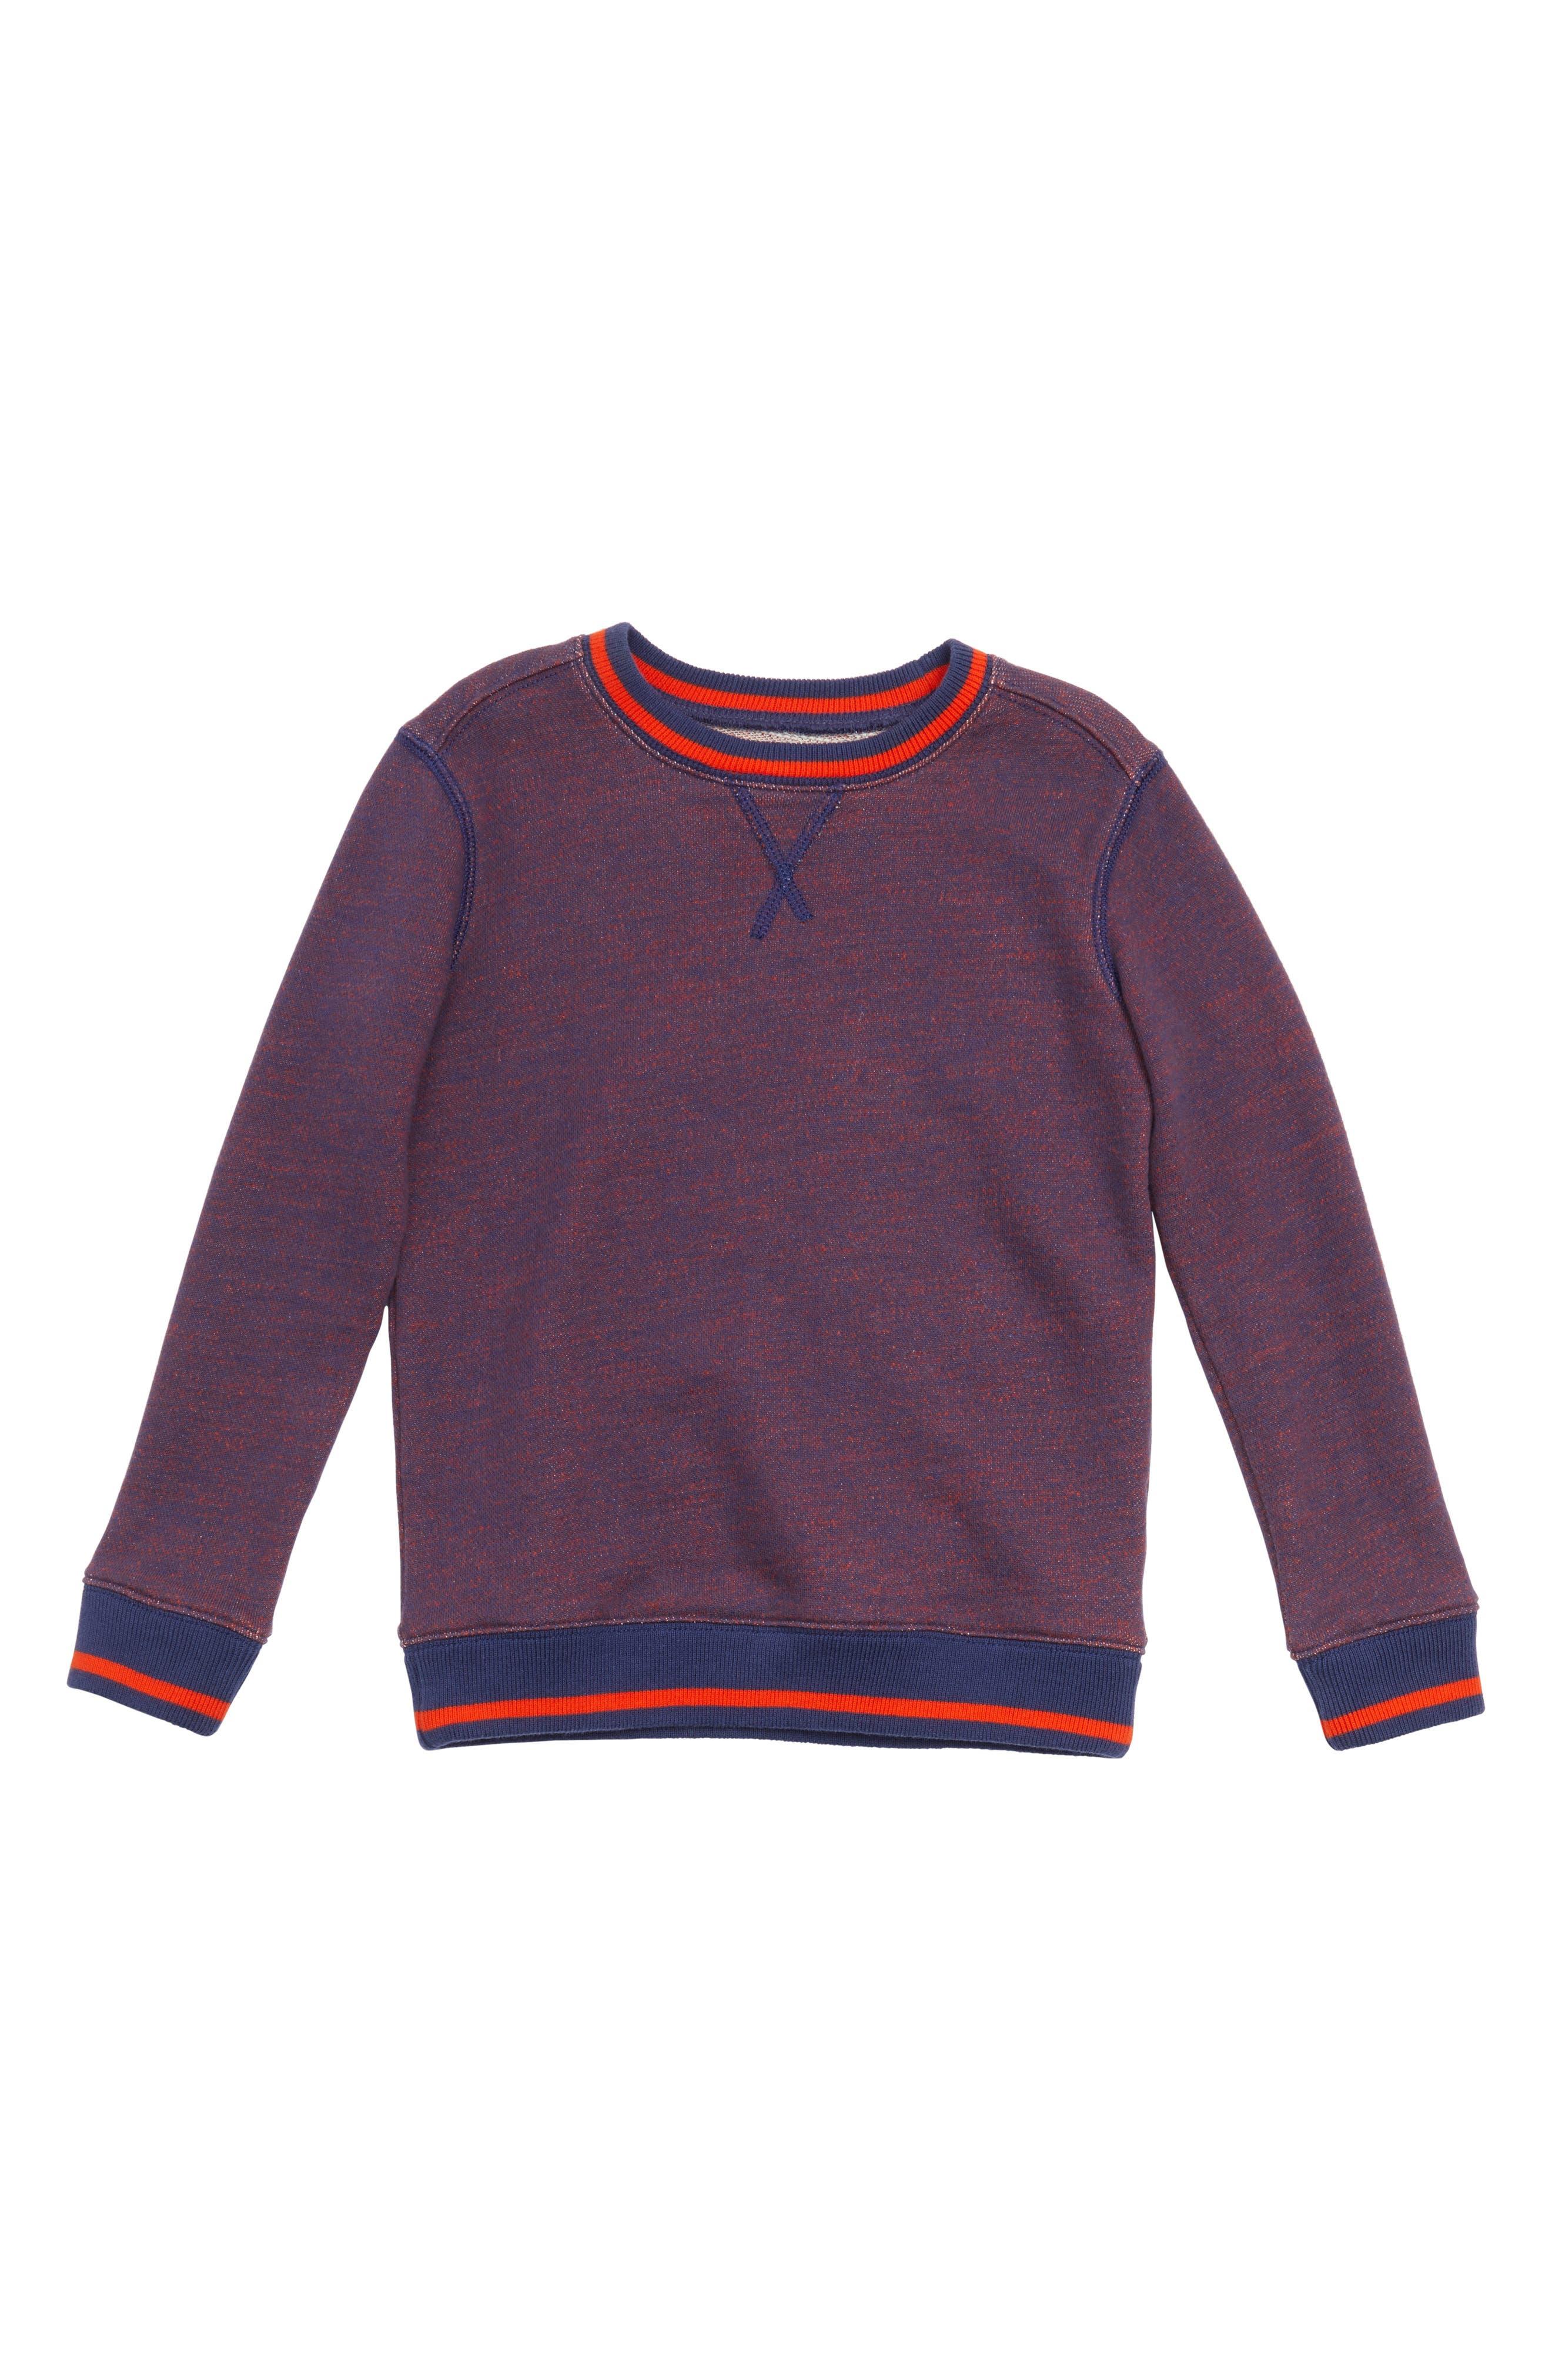 Crewneck Sweatshirt,                         Main,                         color, Navy Denim- Red